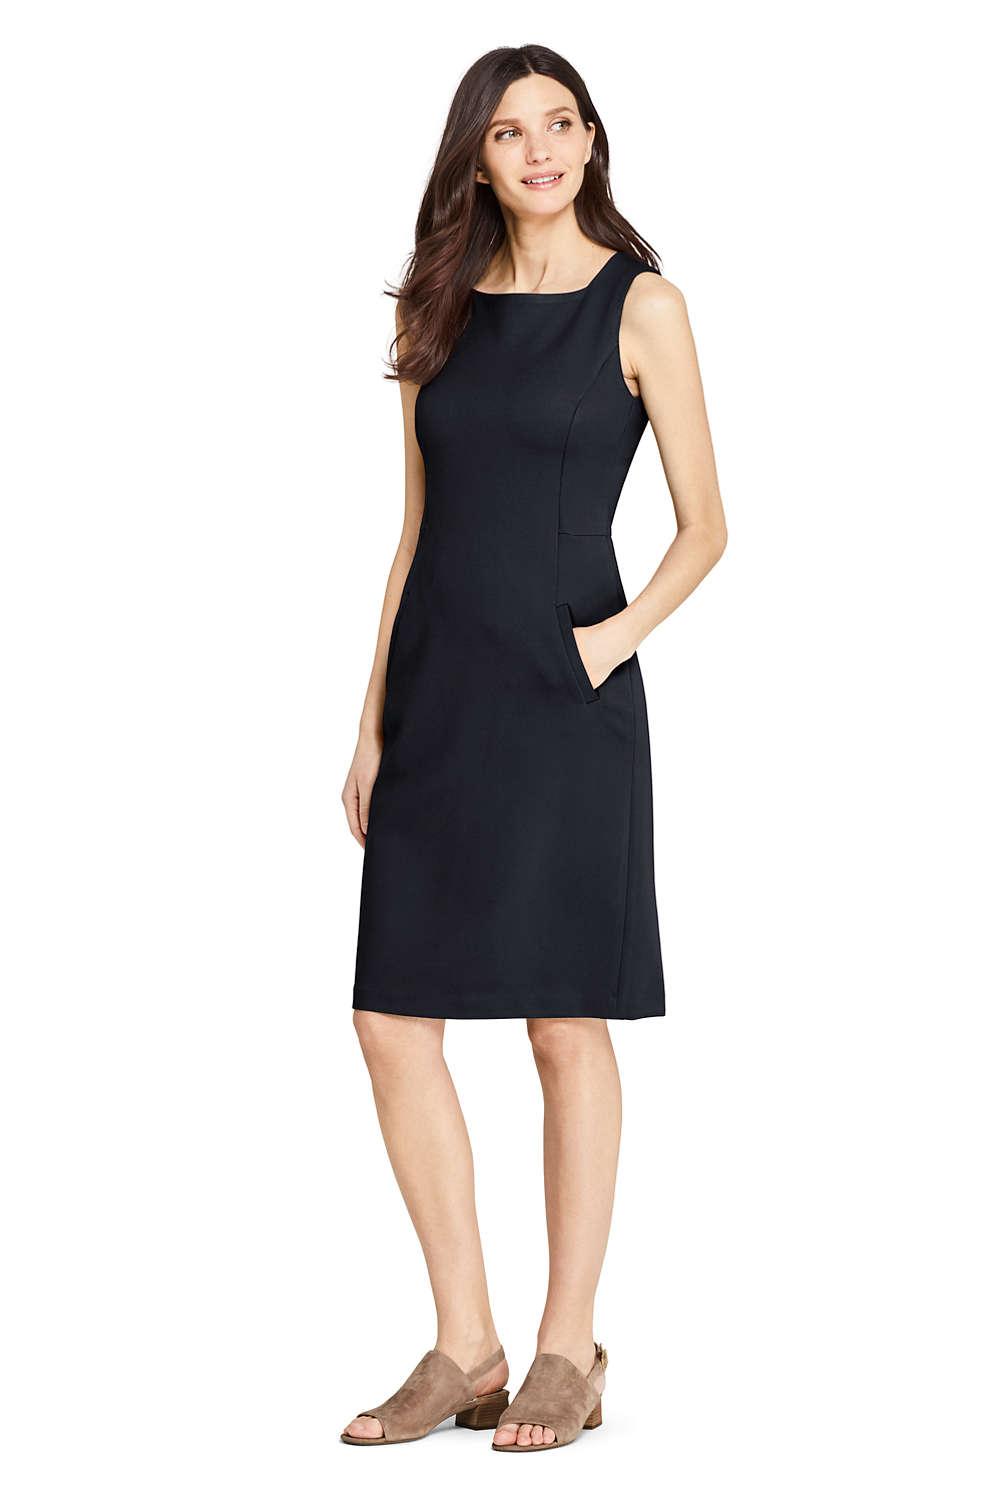 611ec8e140 Women s Sleeveless Square Neck Ponte Sheath Dress from Lands  End